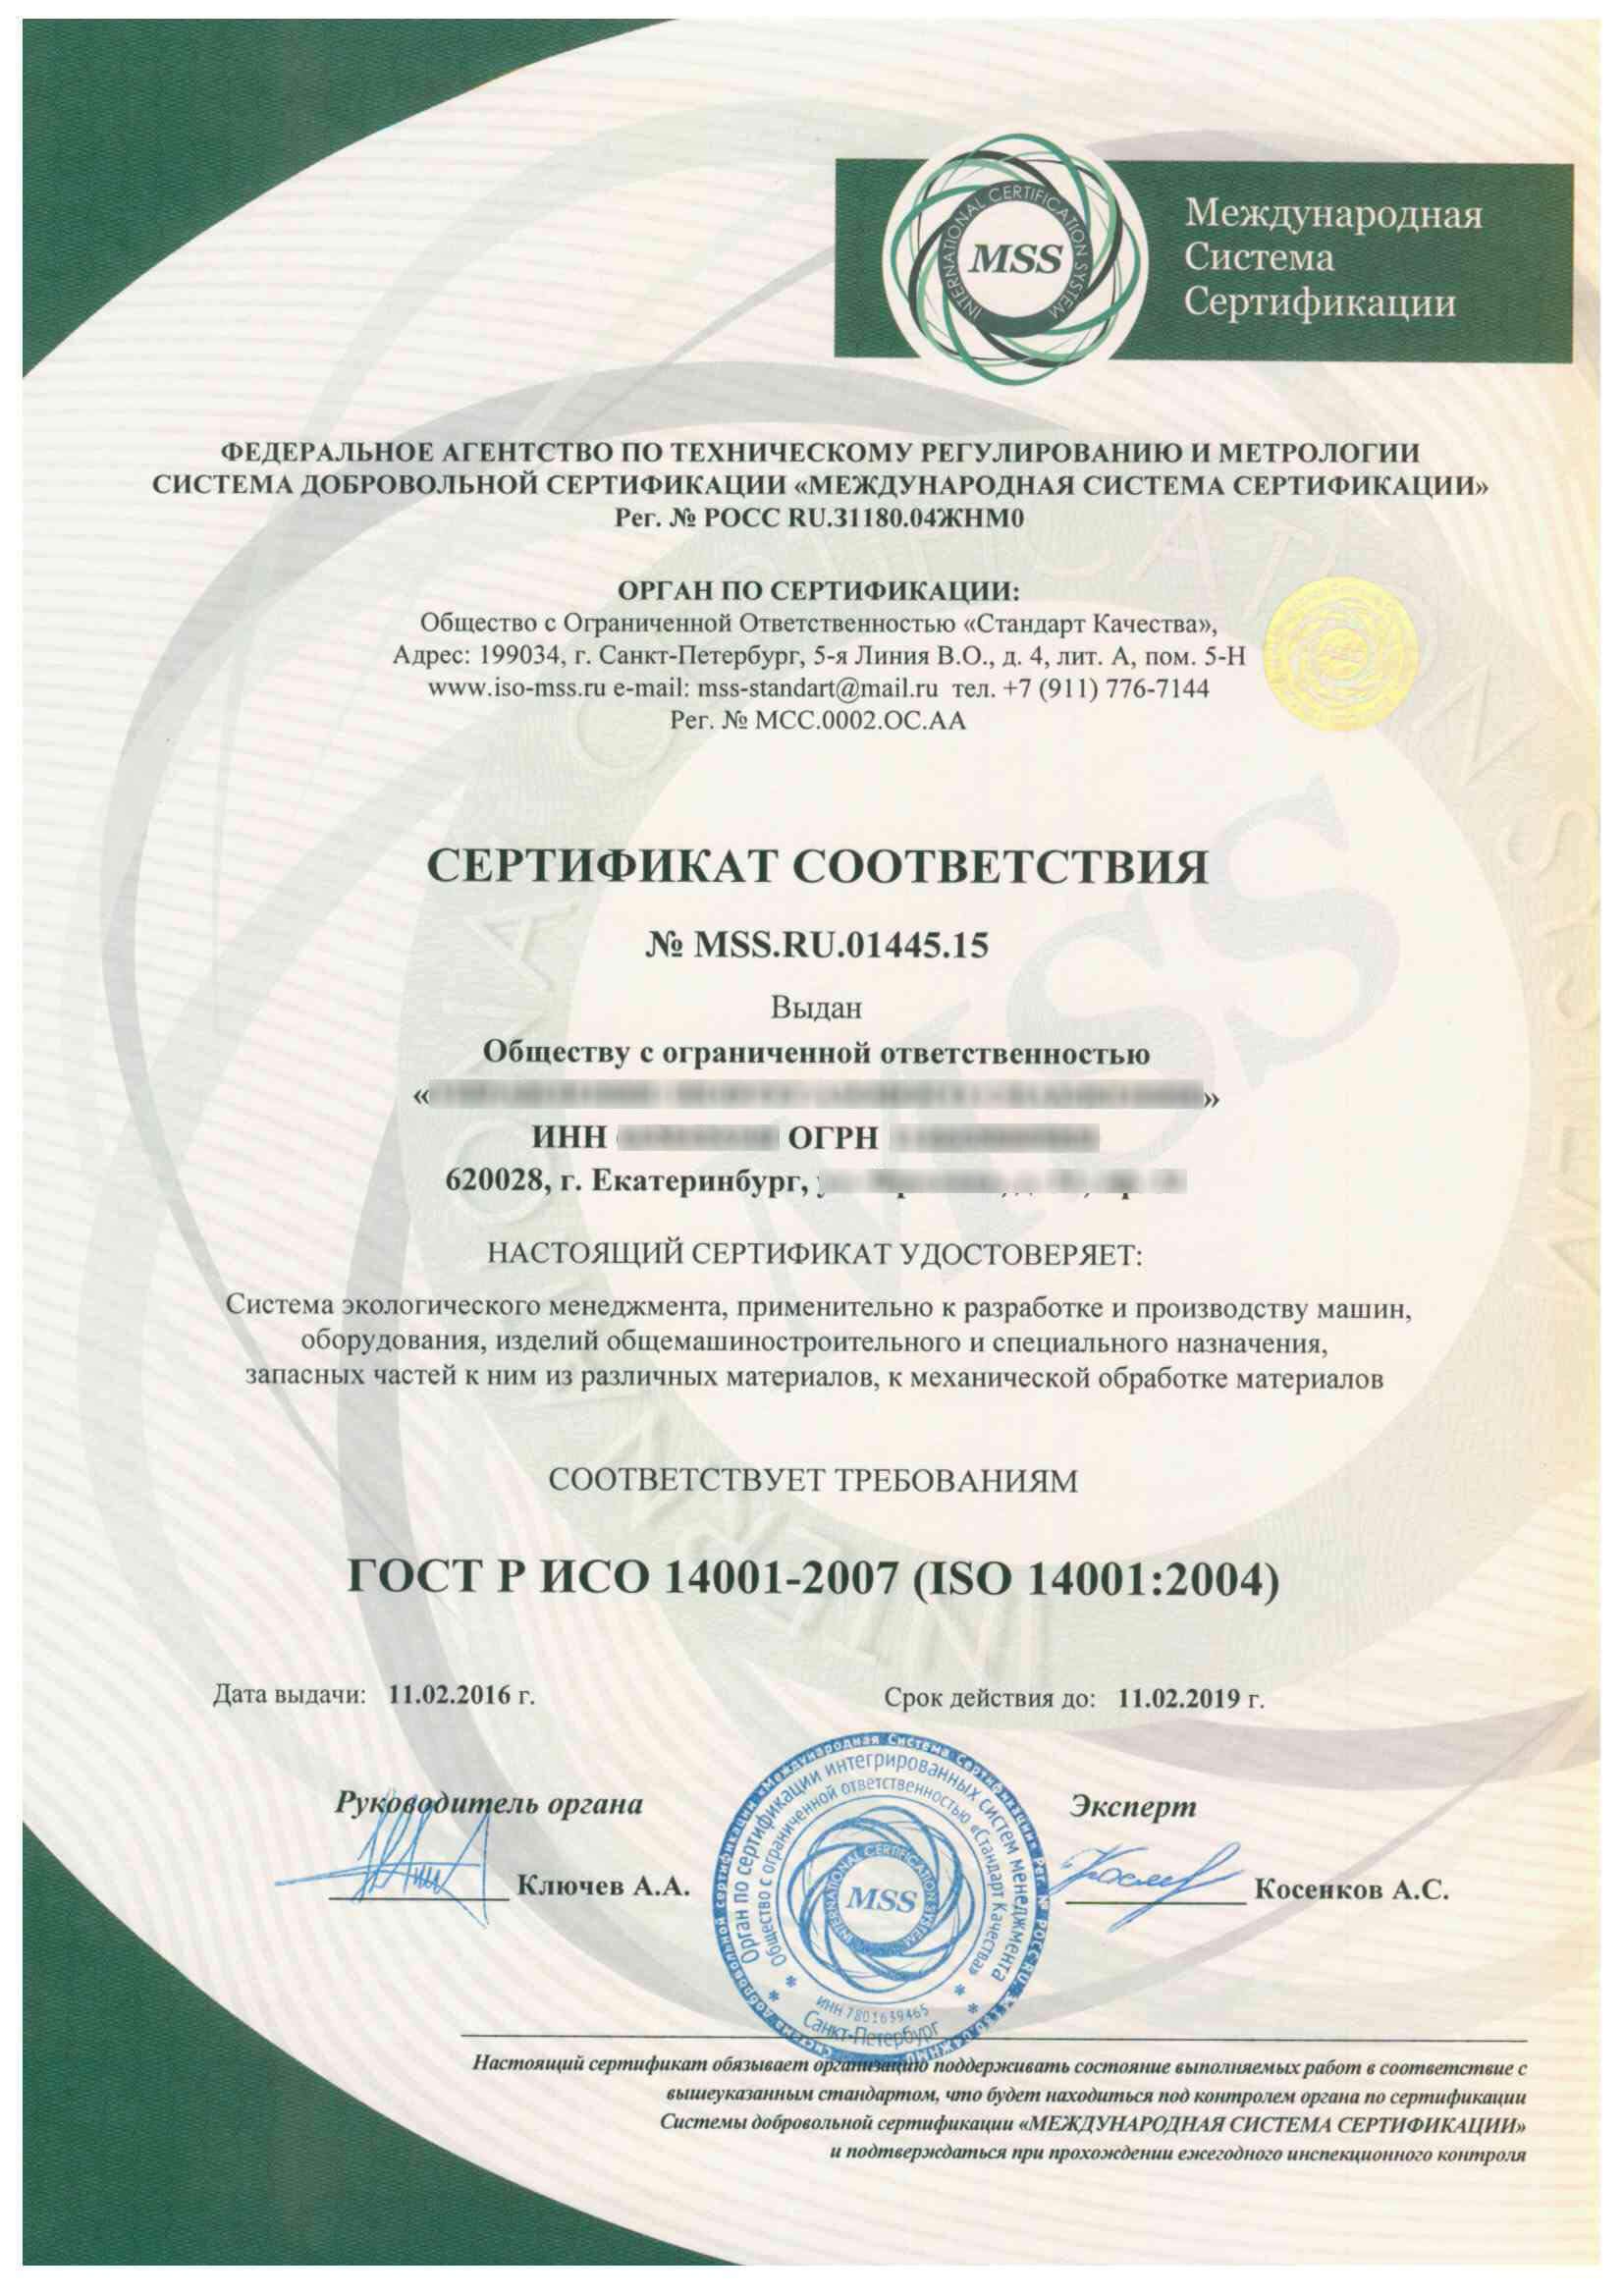 ИСО 14001 2016 в Черкесске